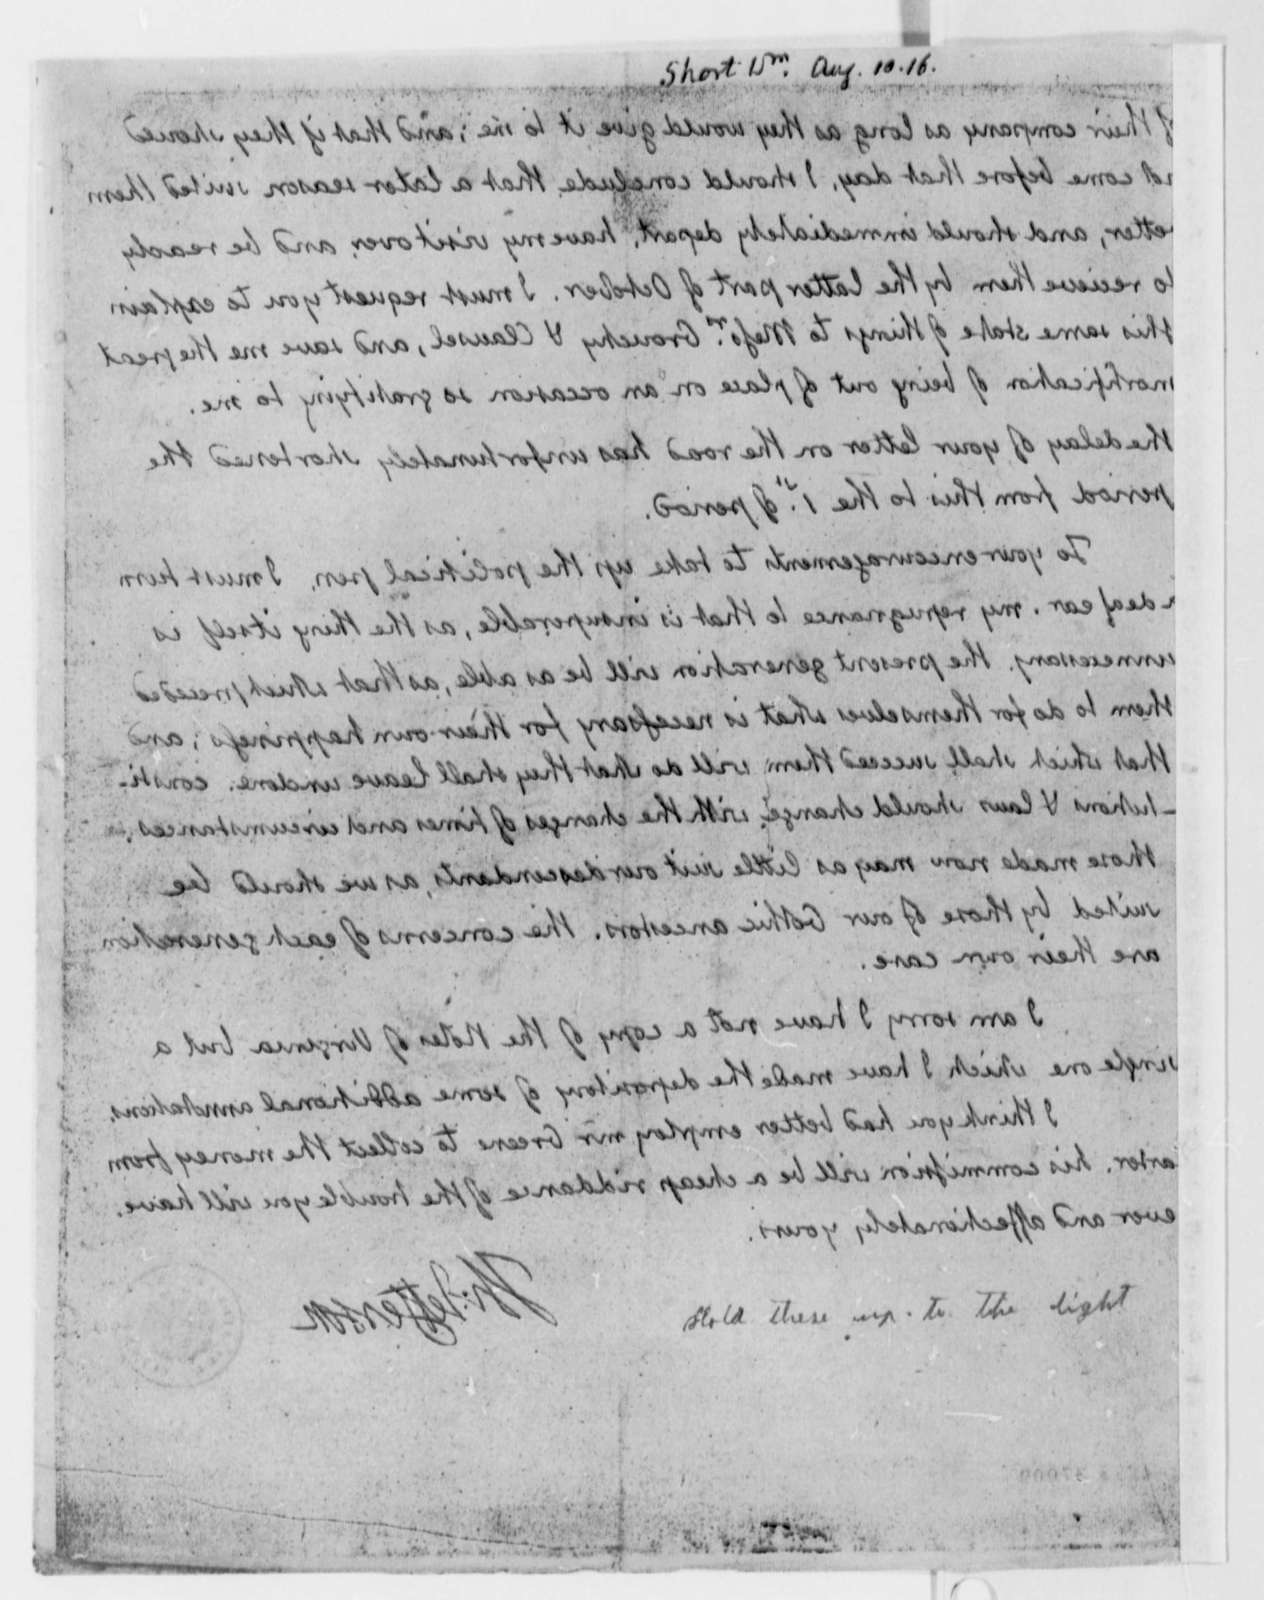 Thomas Jefferson to William Short, August 10, 1816